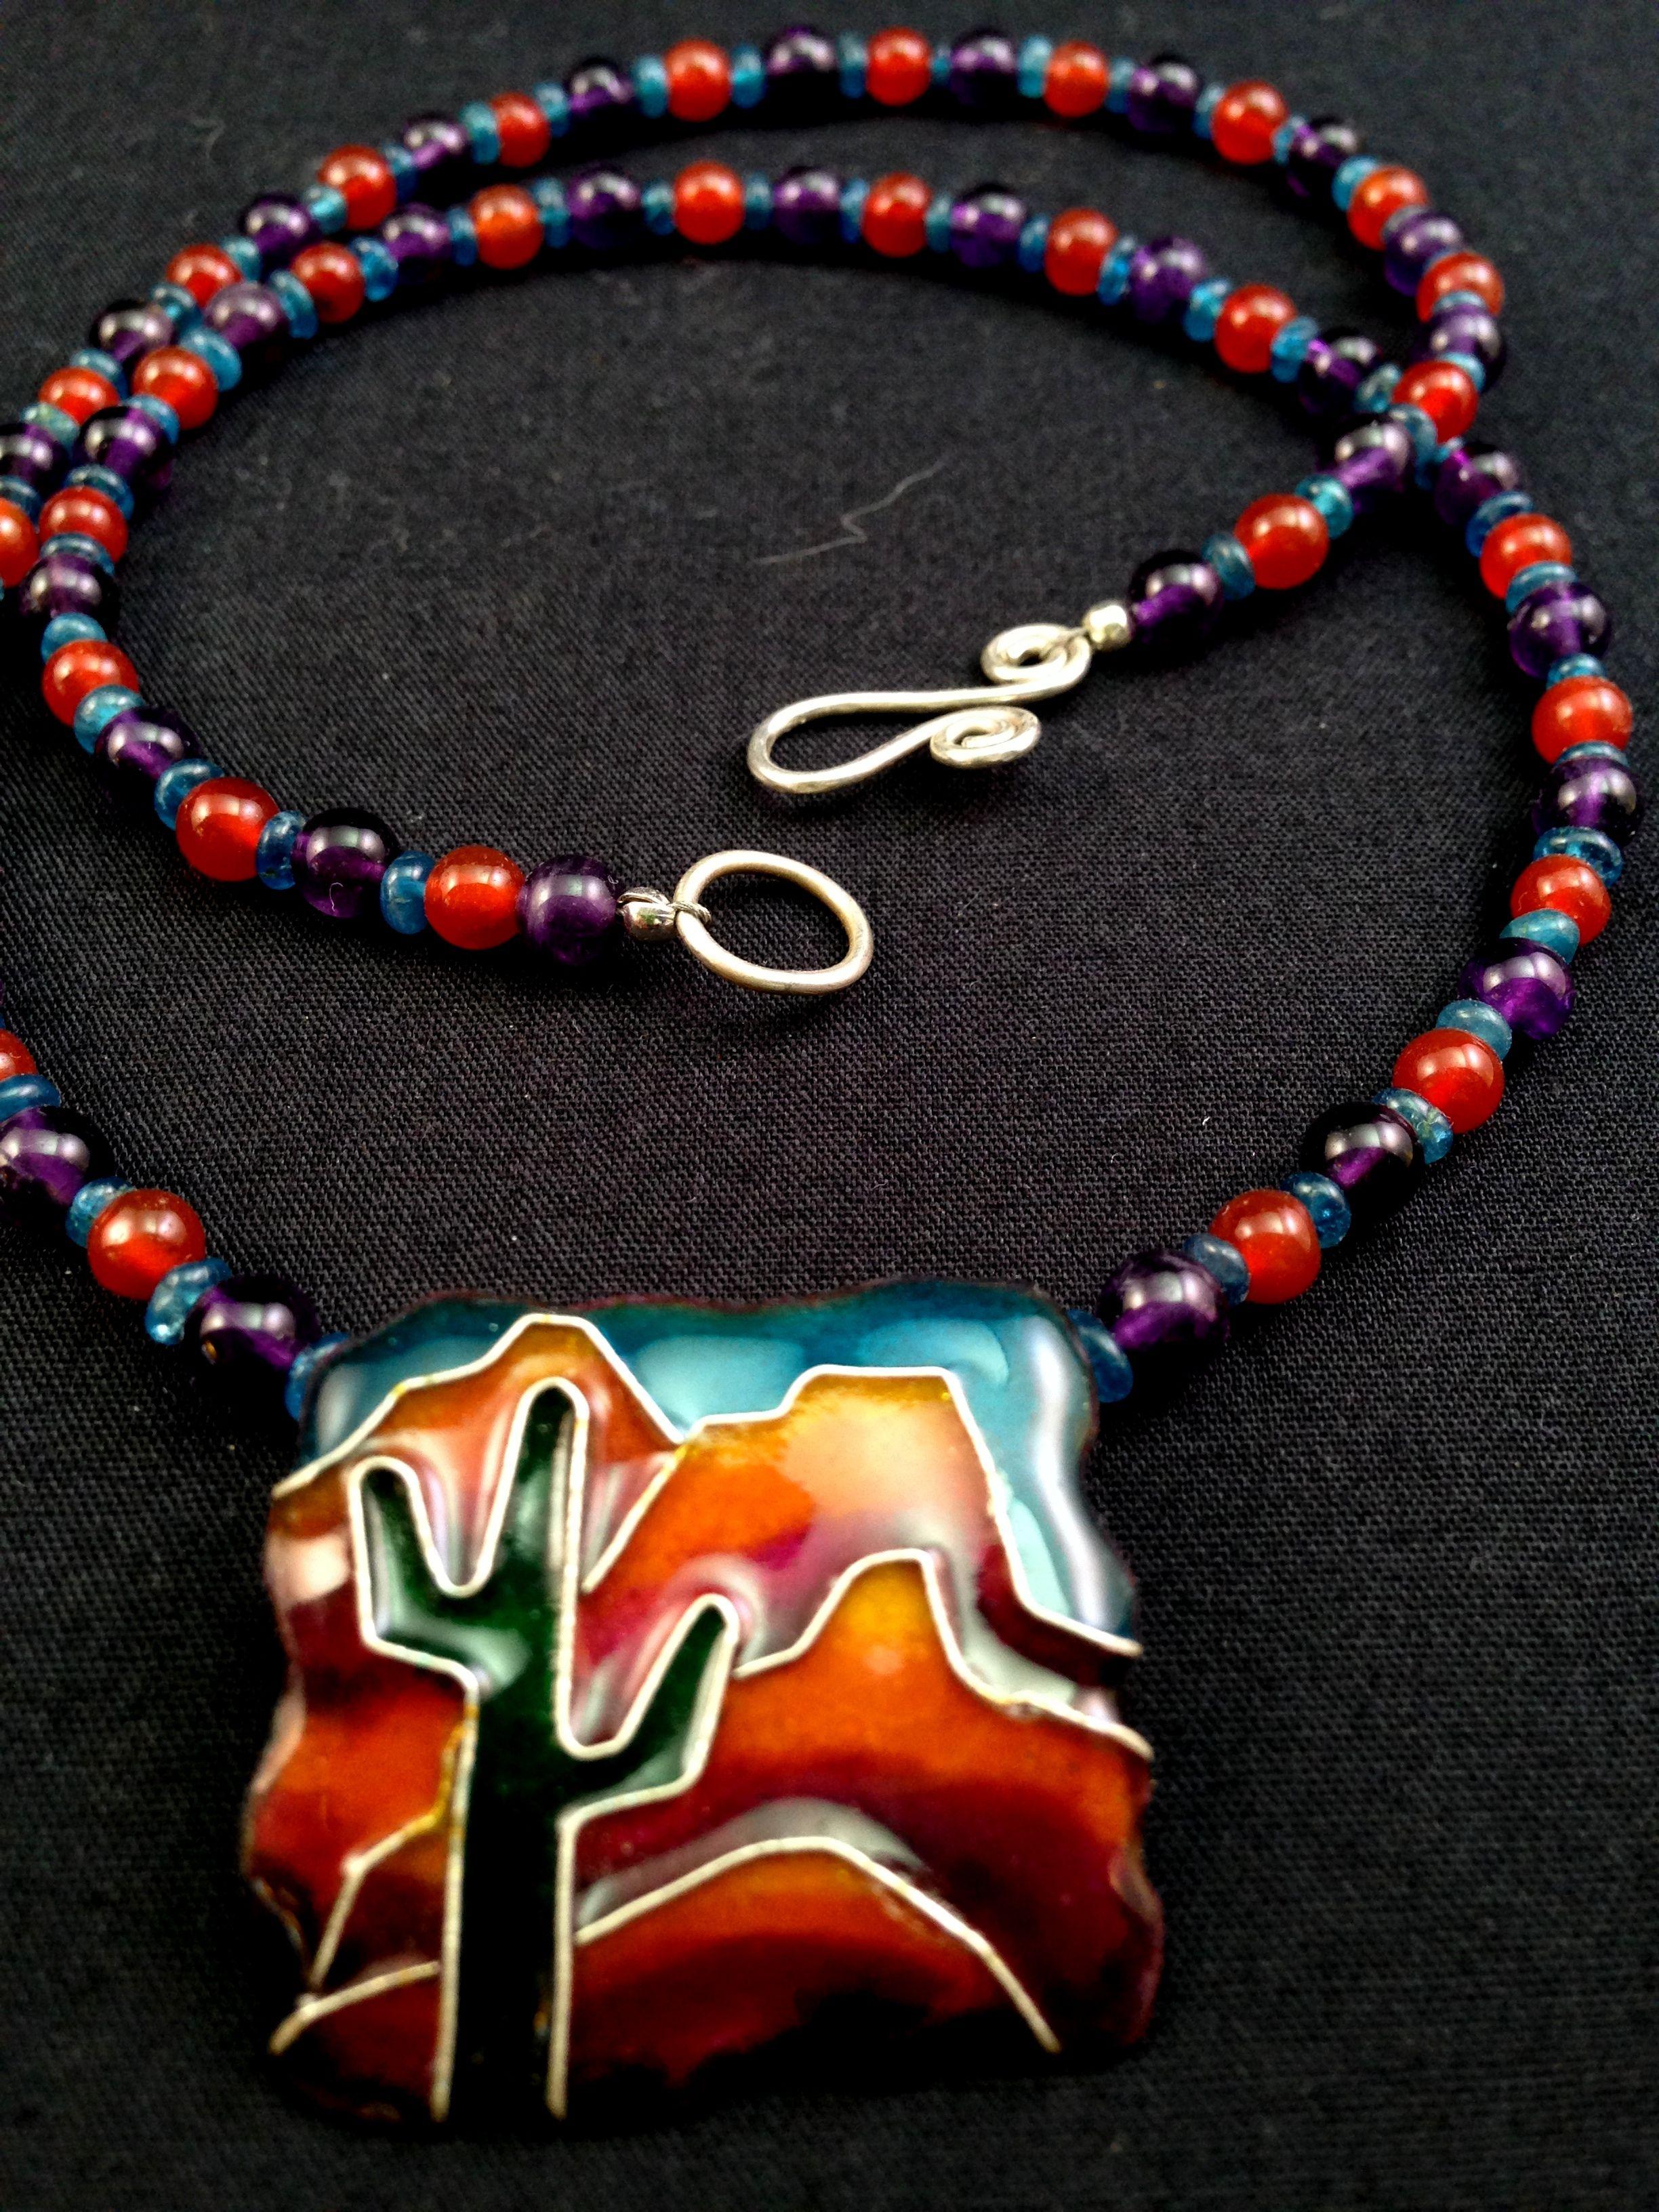 cloisonne enamel, natural gemstone beads Amethyst, apatite